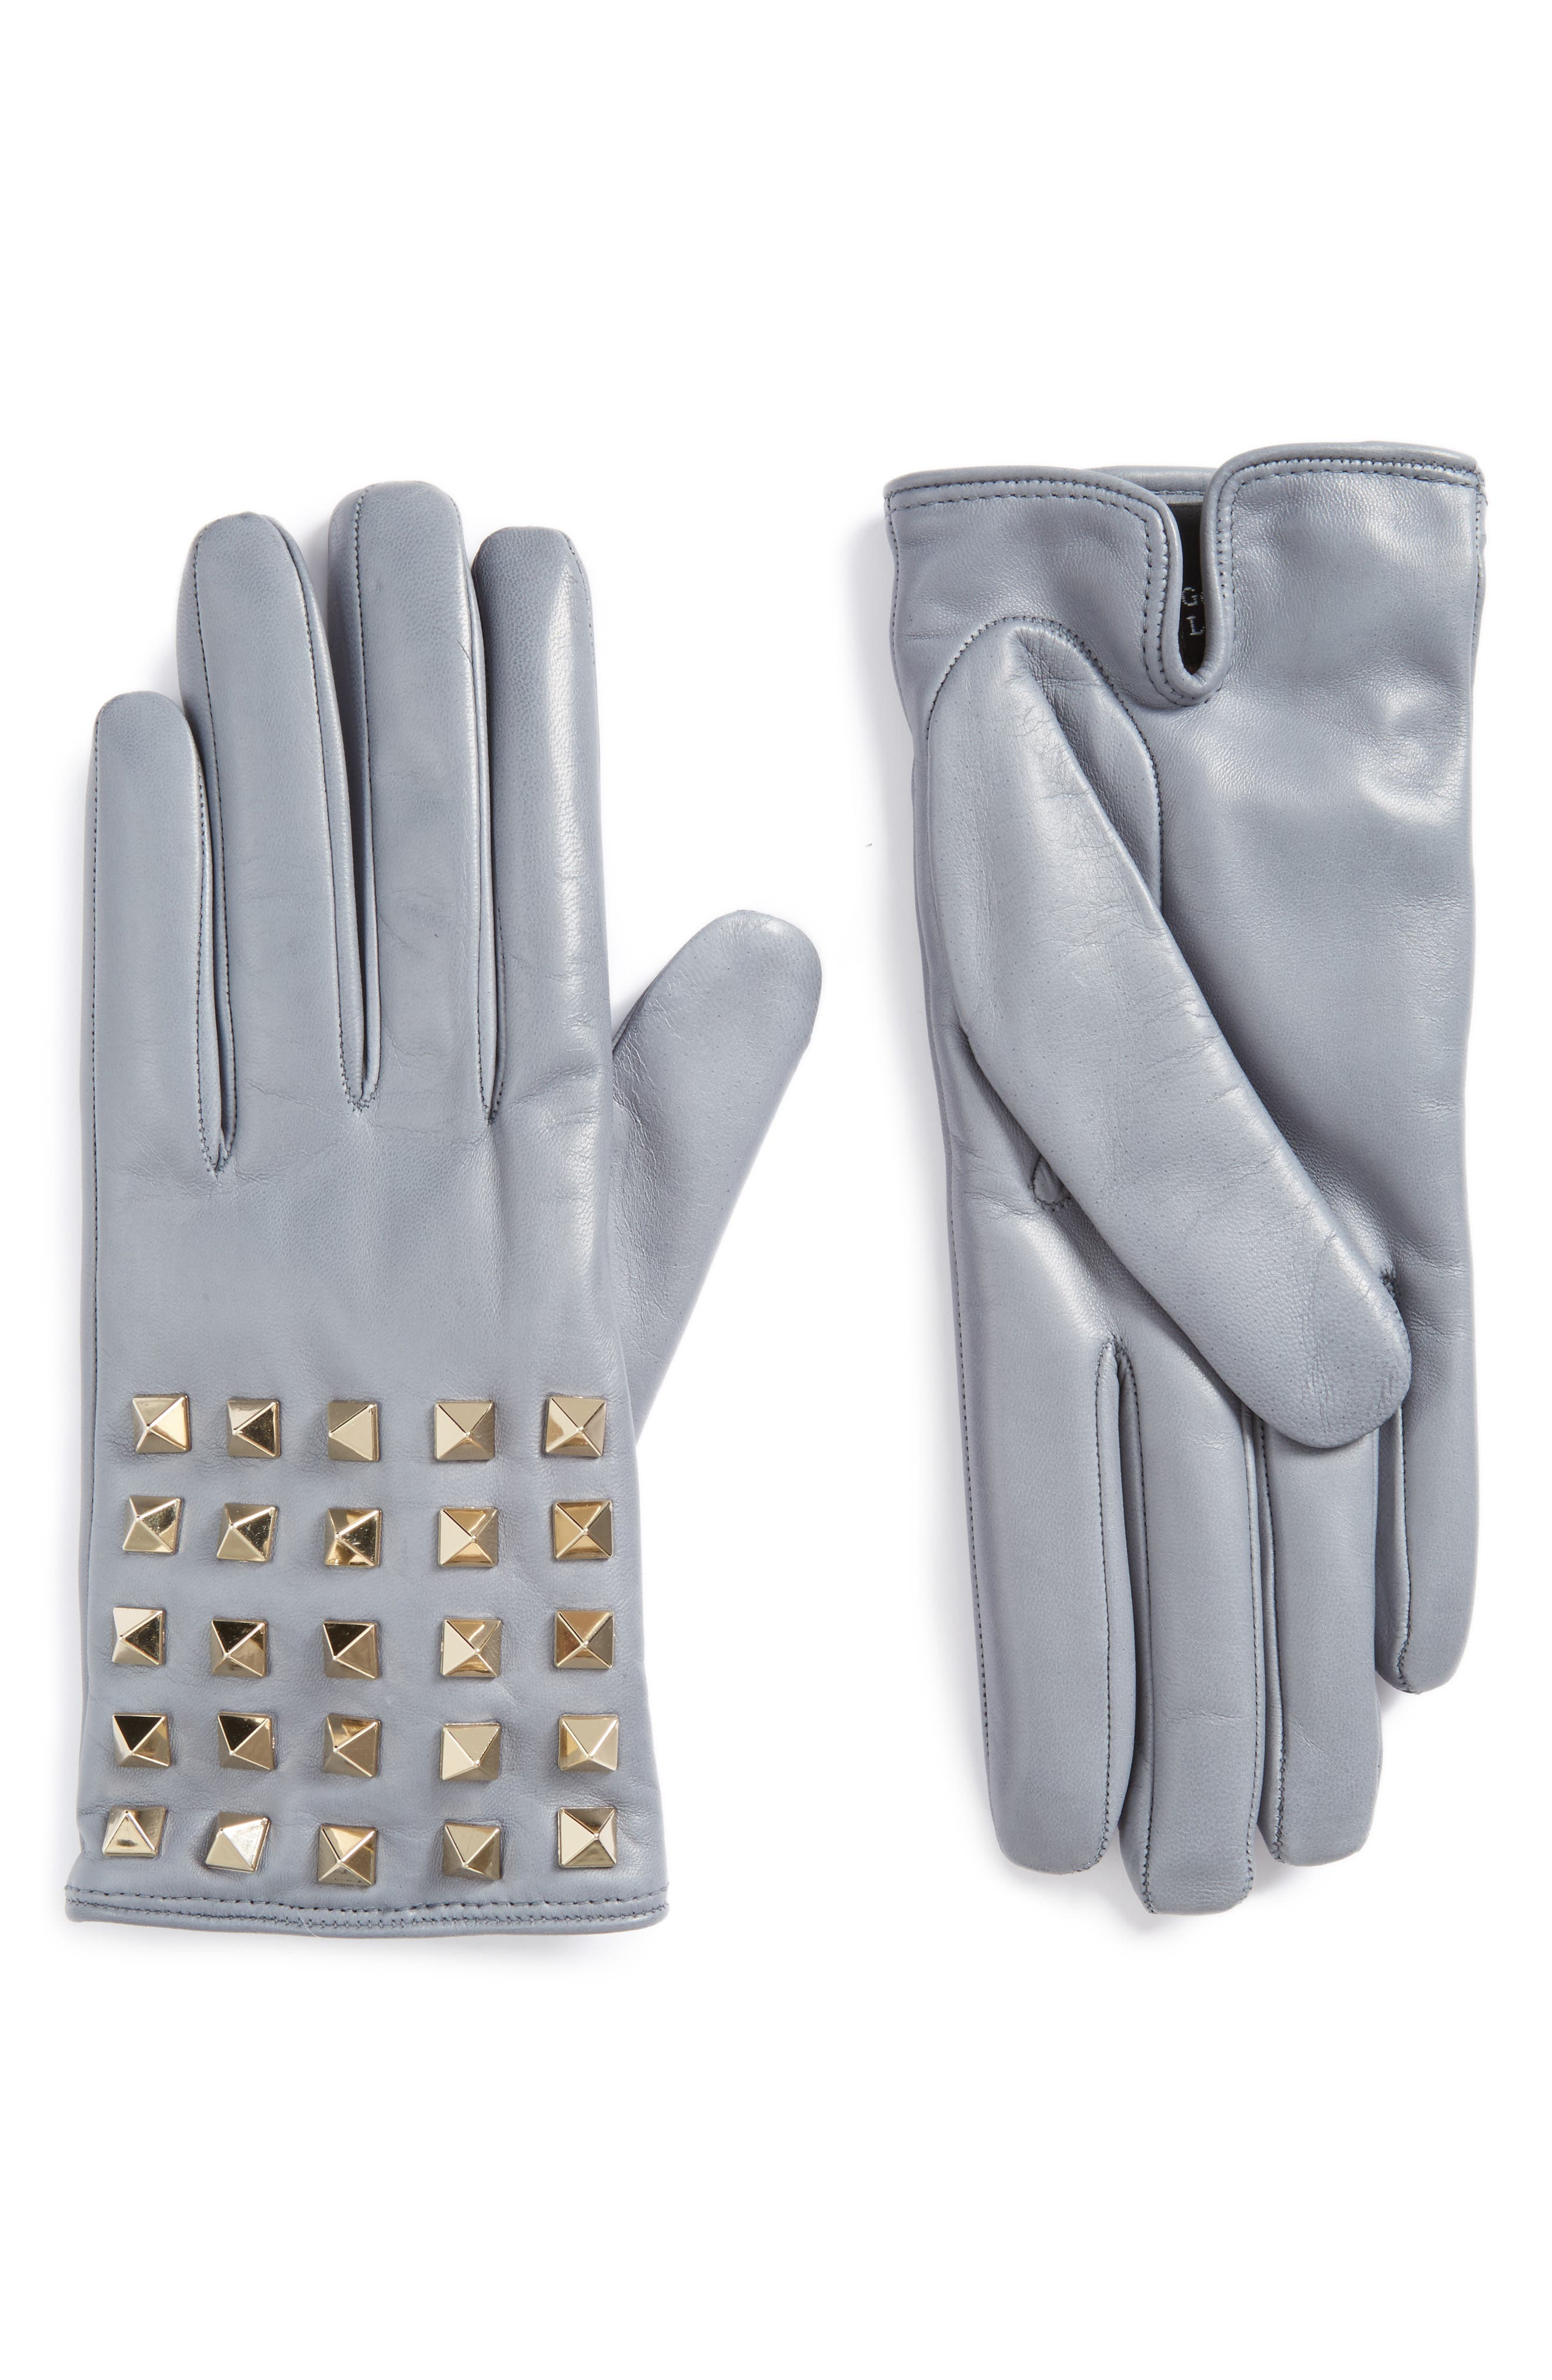 VALENTINO GARAVANI Rockstud Leather Gloves, Main, color, POWDER